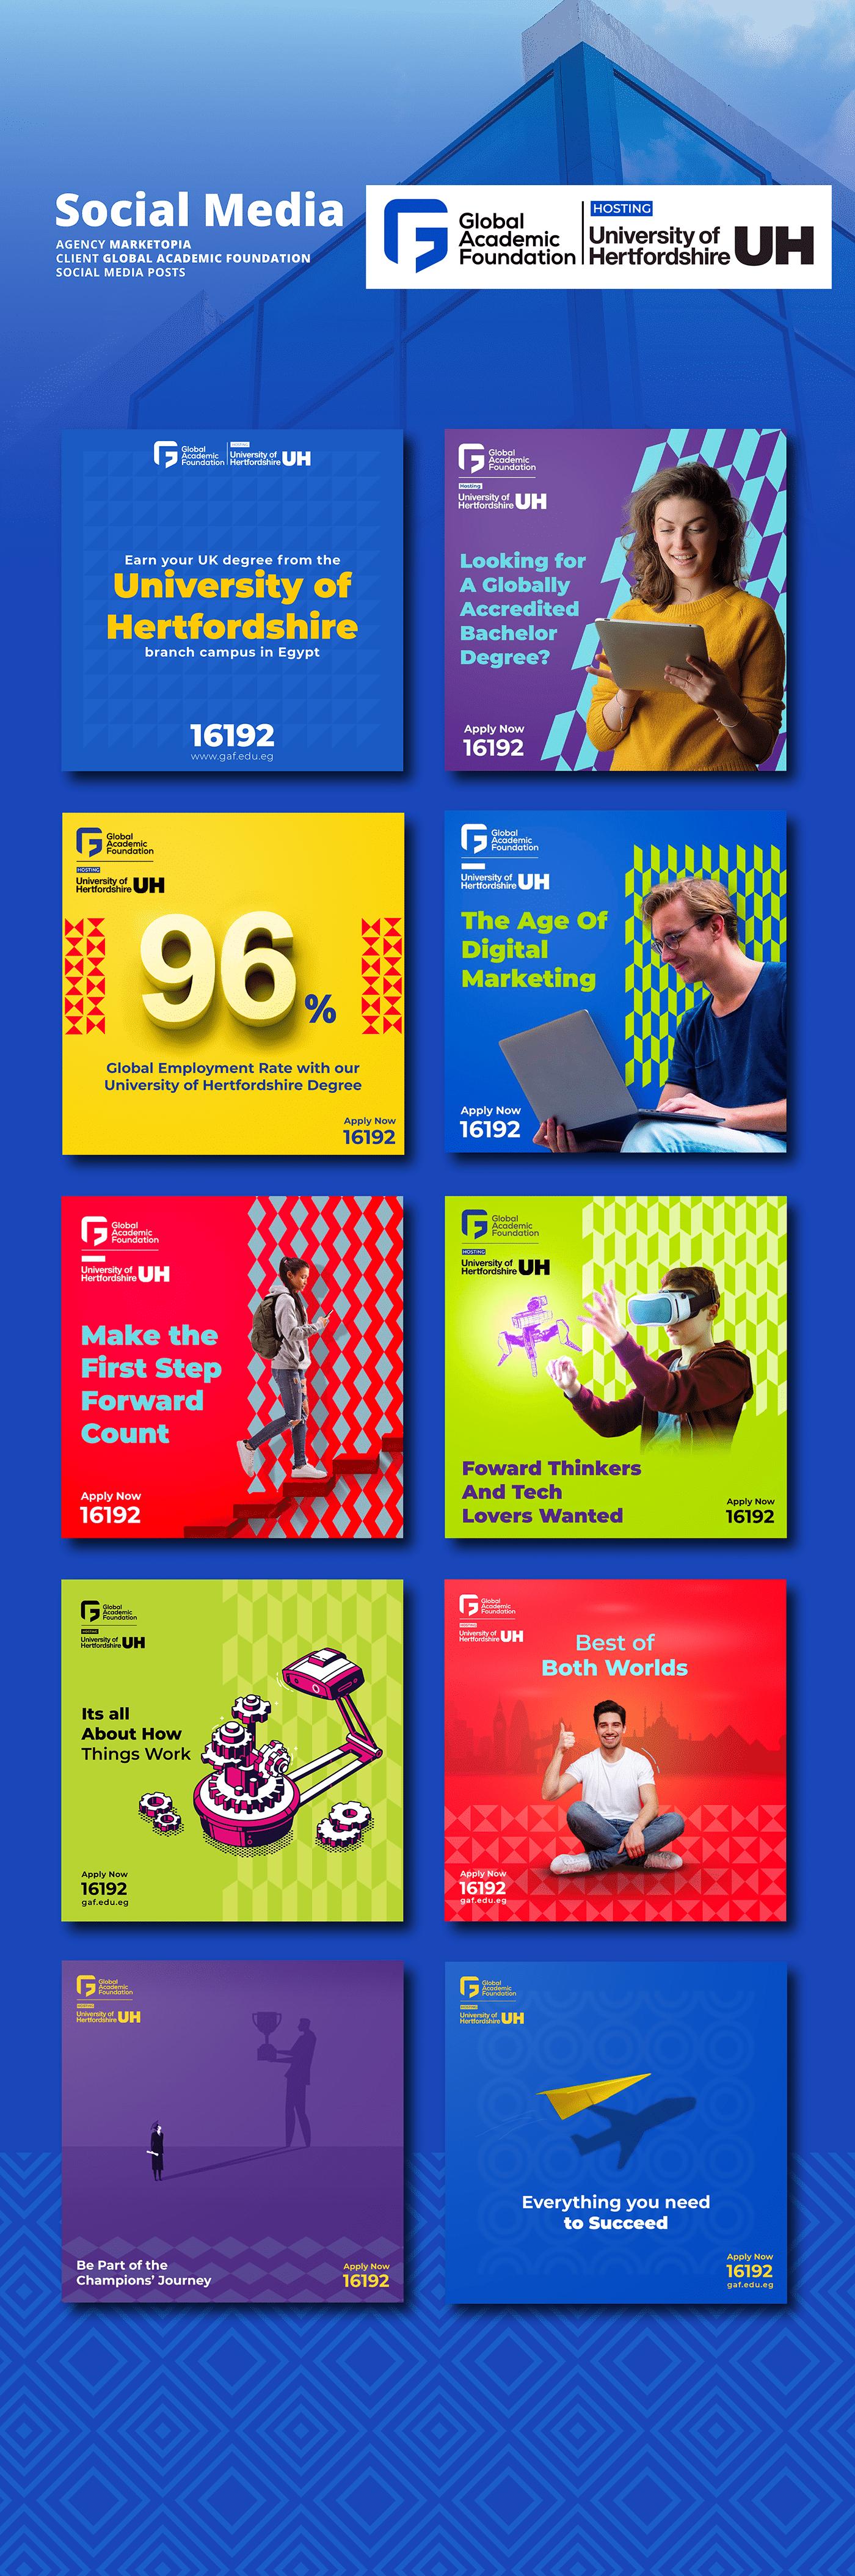 colourful brand content calendar egypt Facebook Posts social media Social Media Designs University